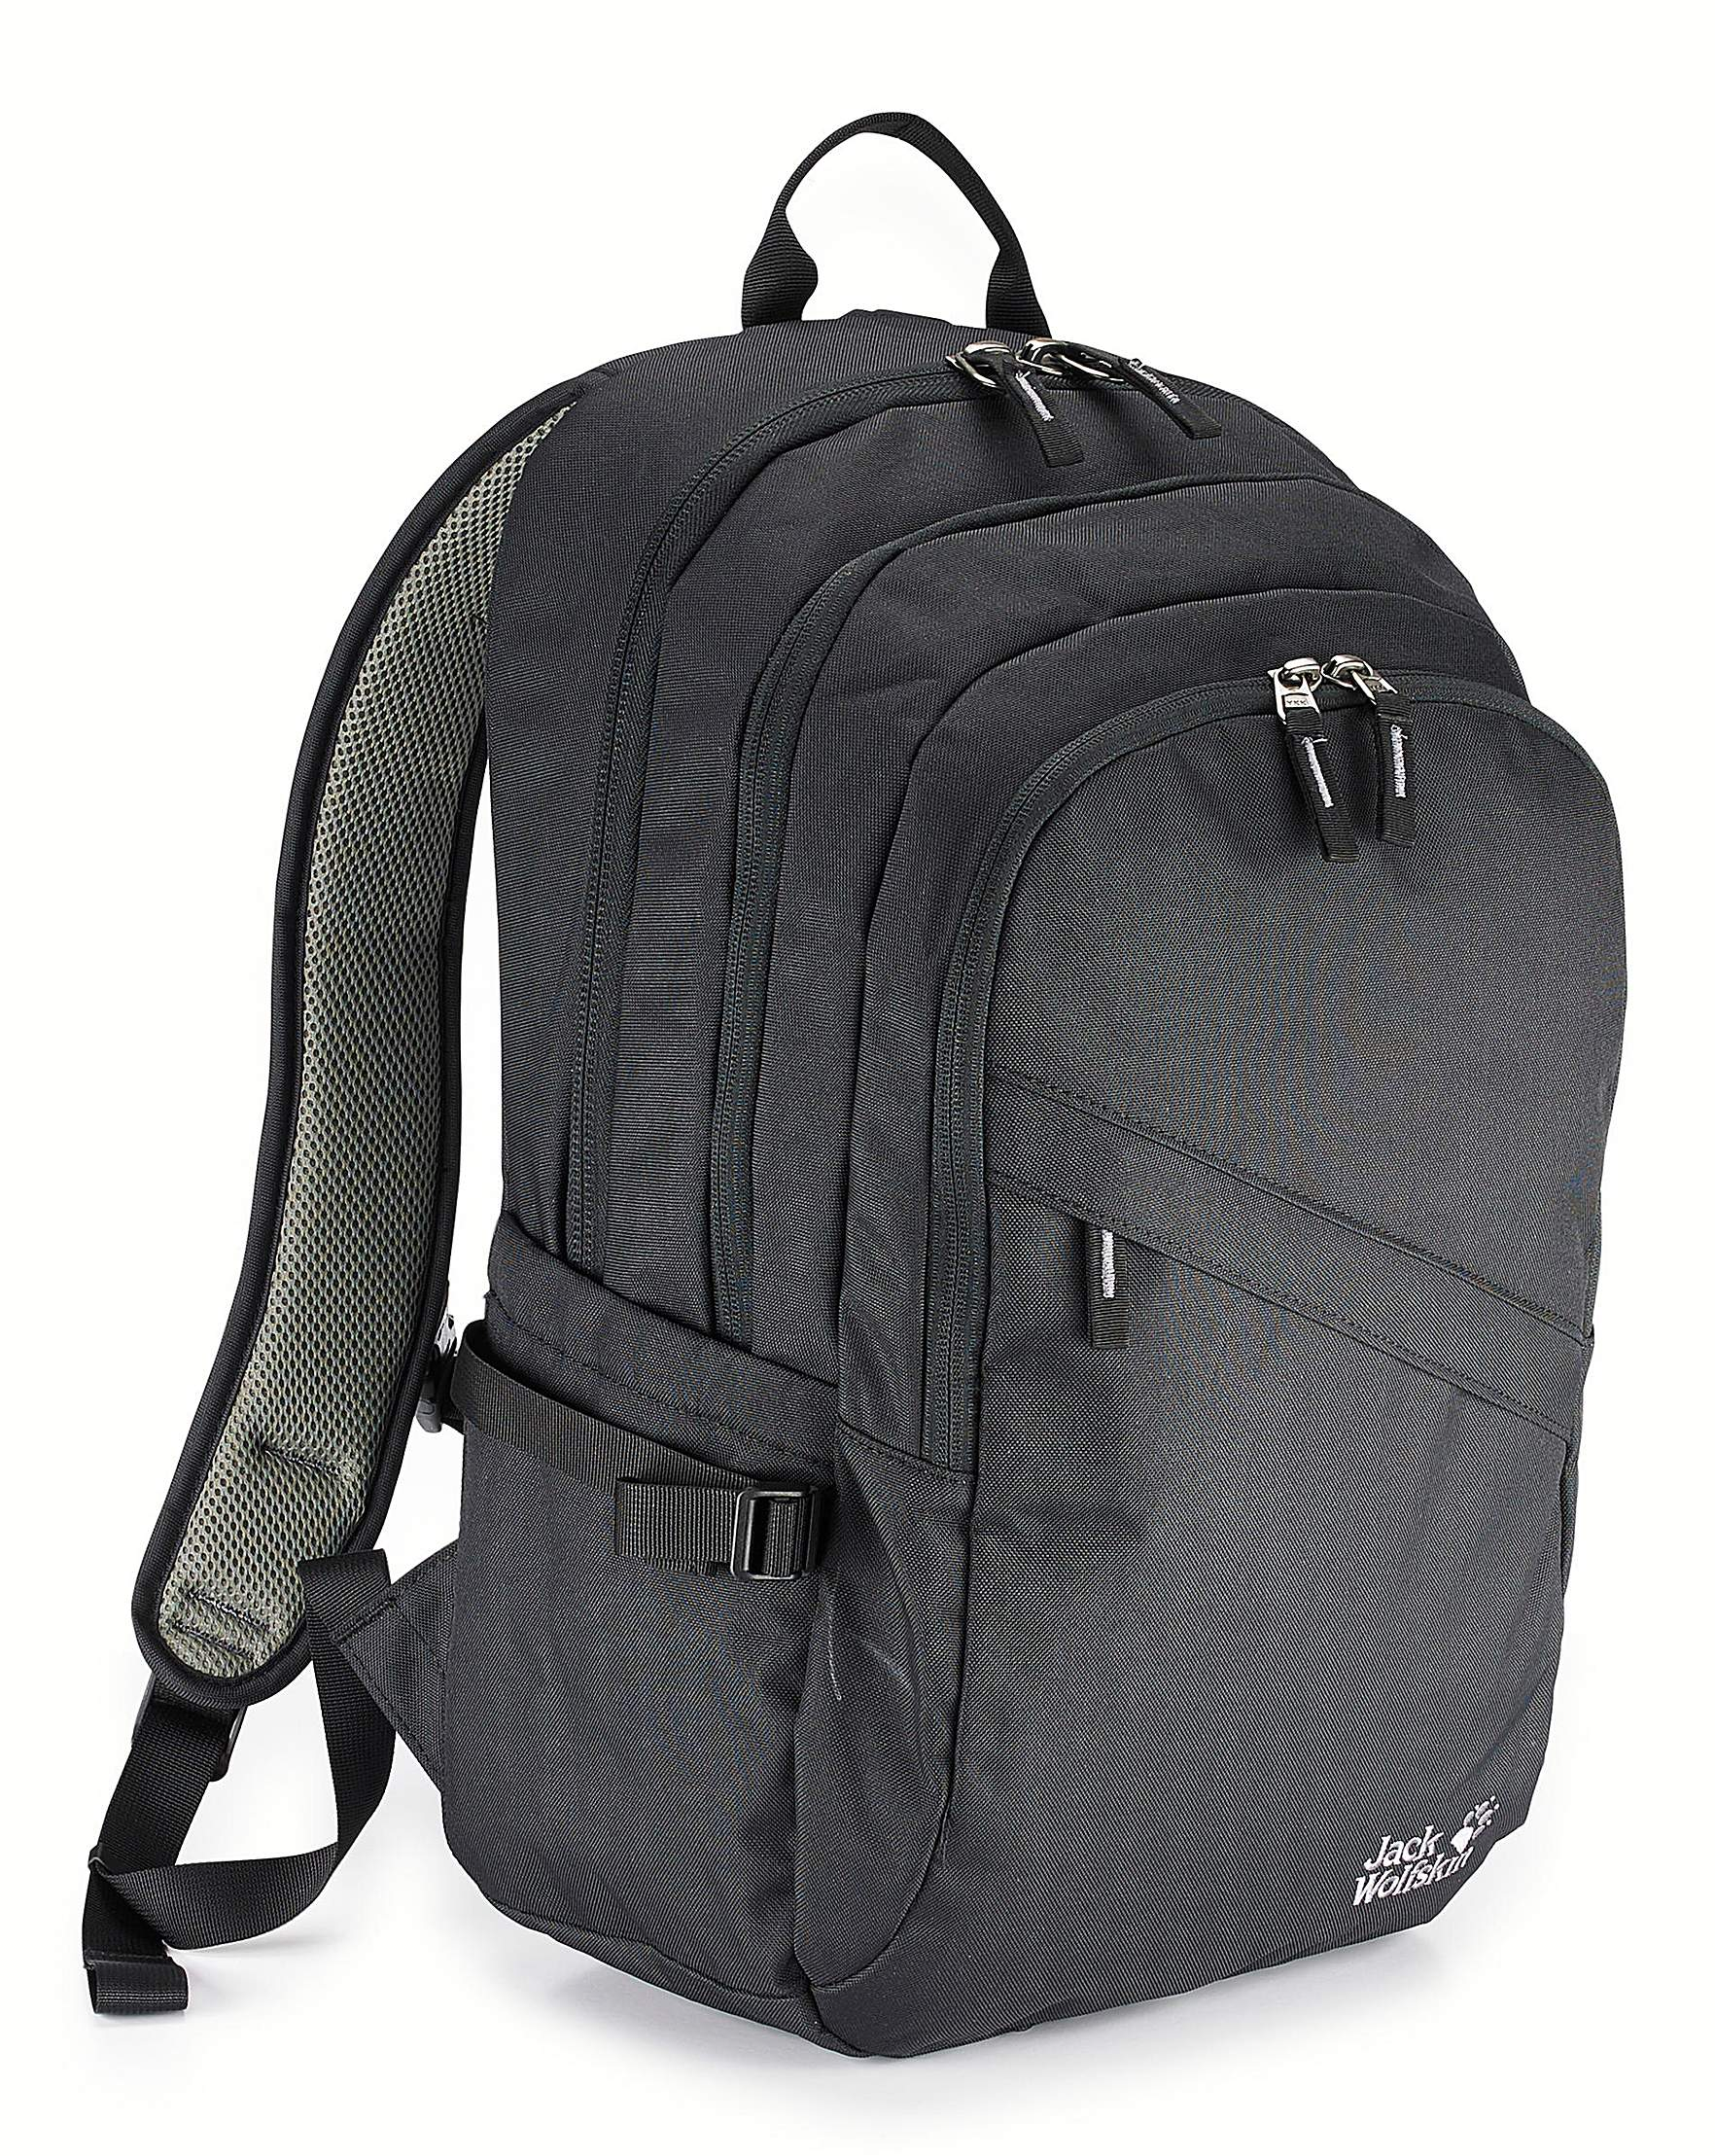 4b2b31611f Jack Wolfskin Dayton Backpack   J D Williams